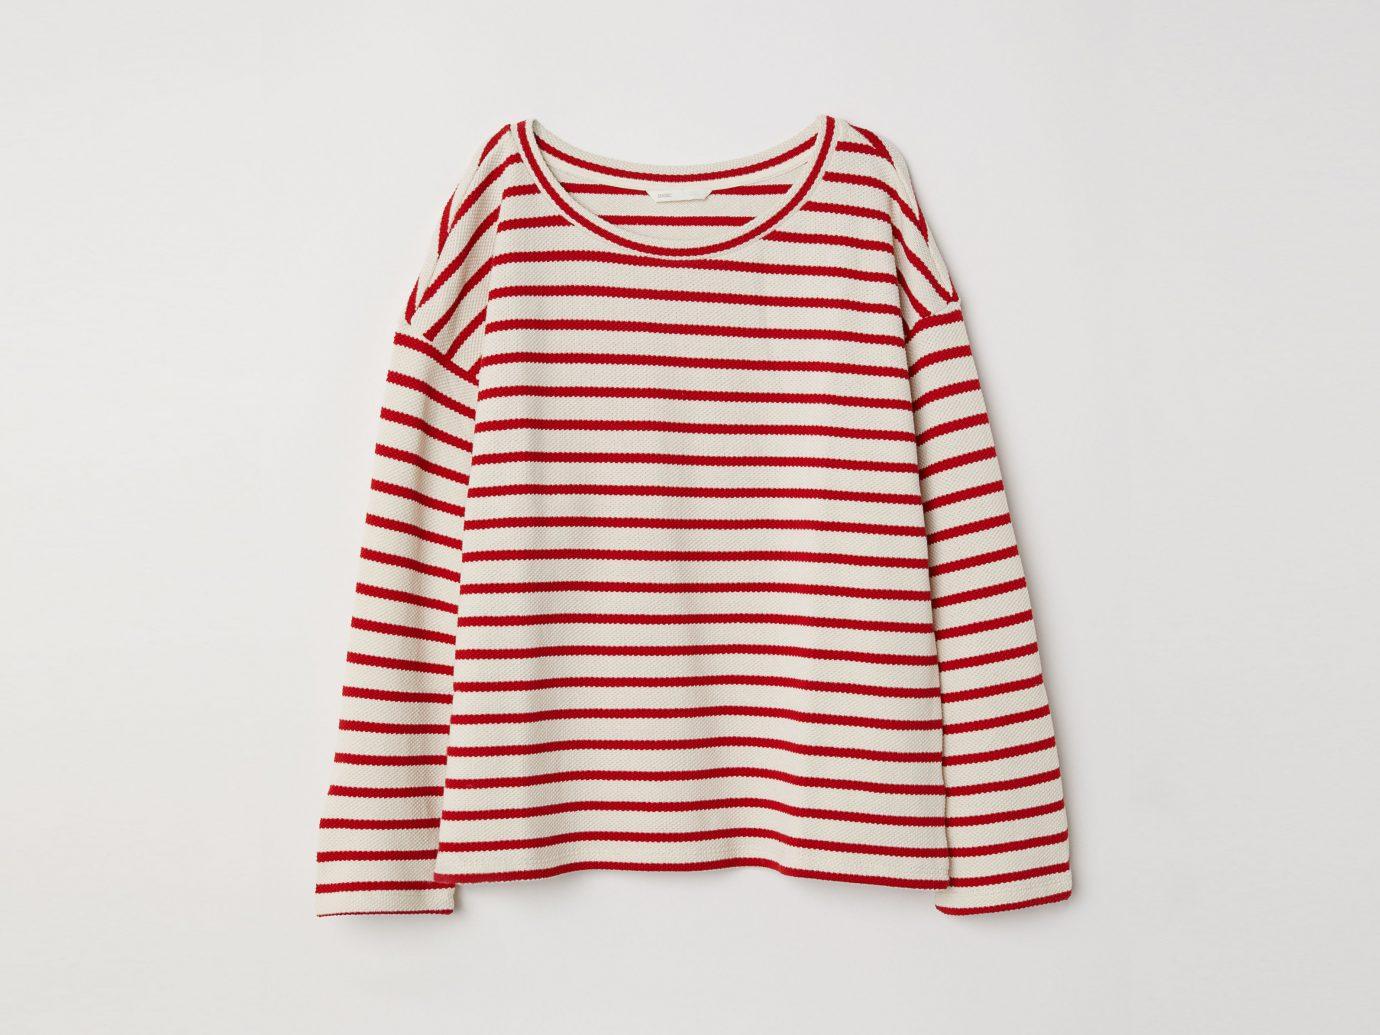 H&M Knit Top, striped top